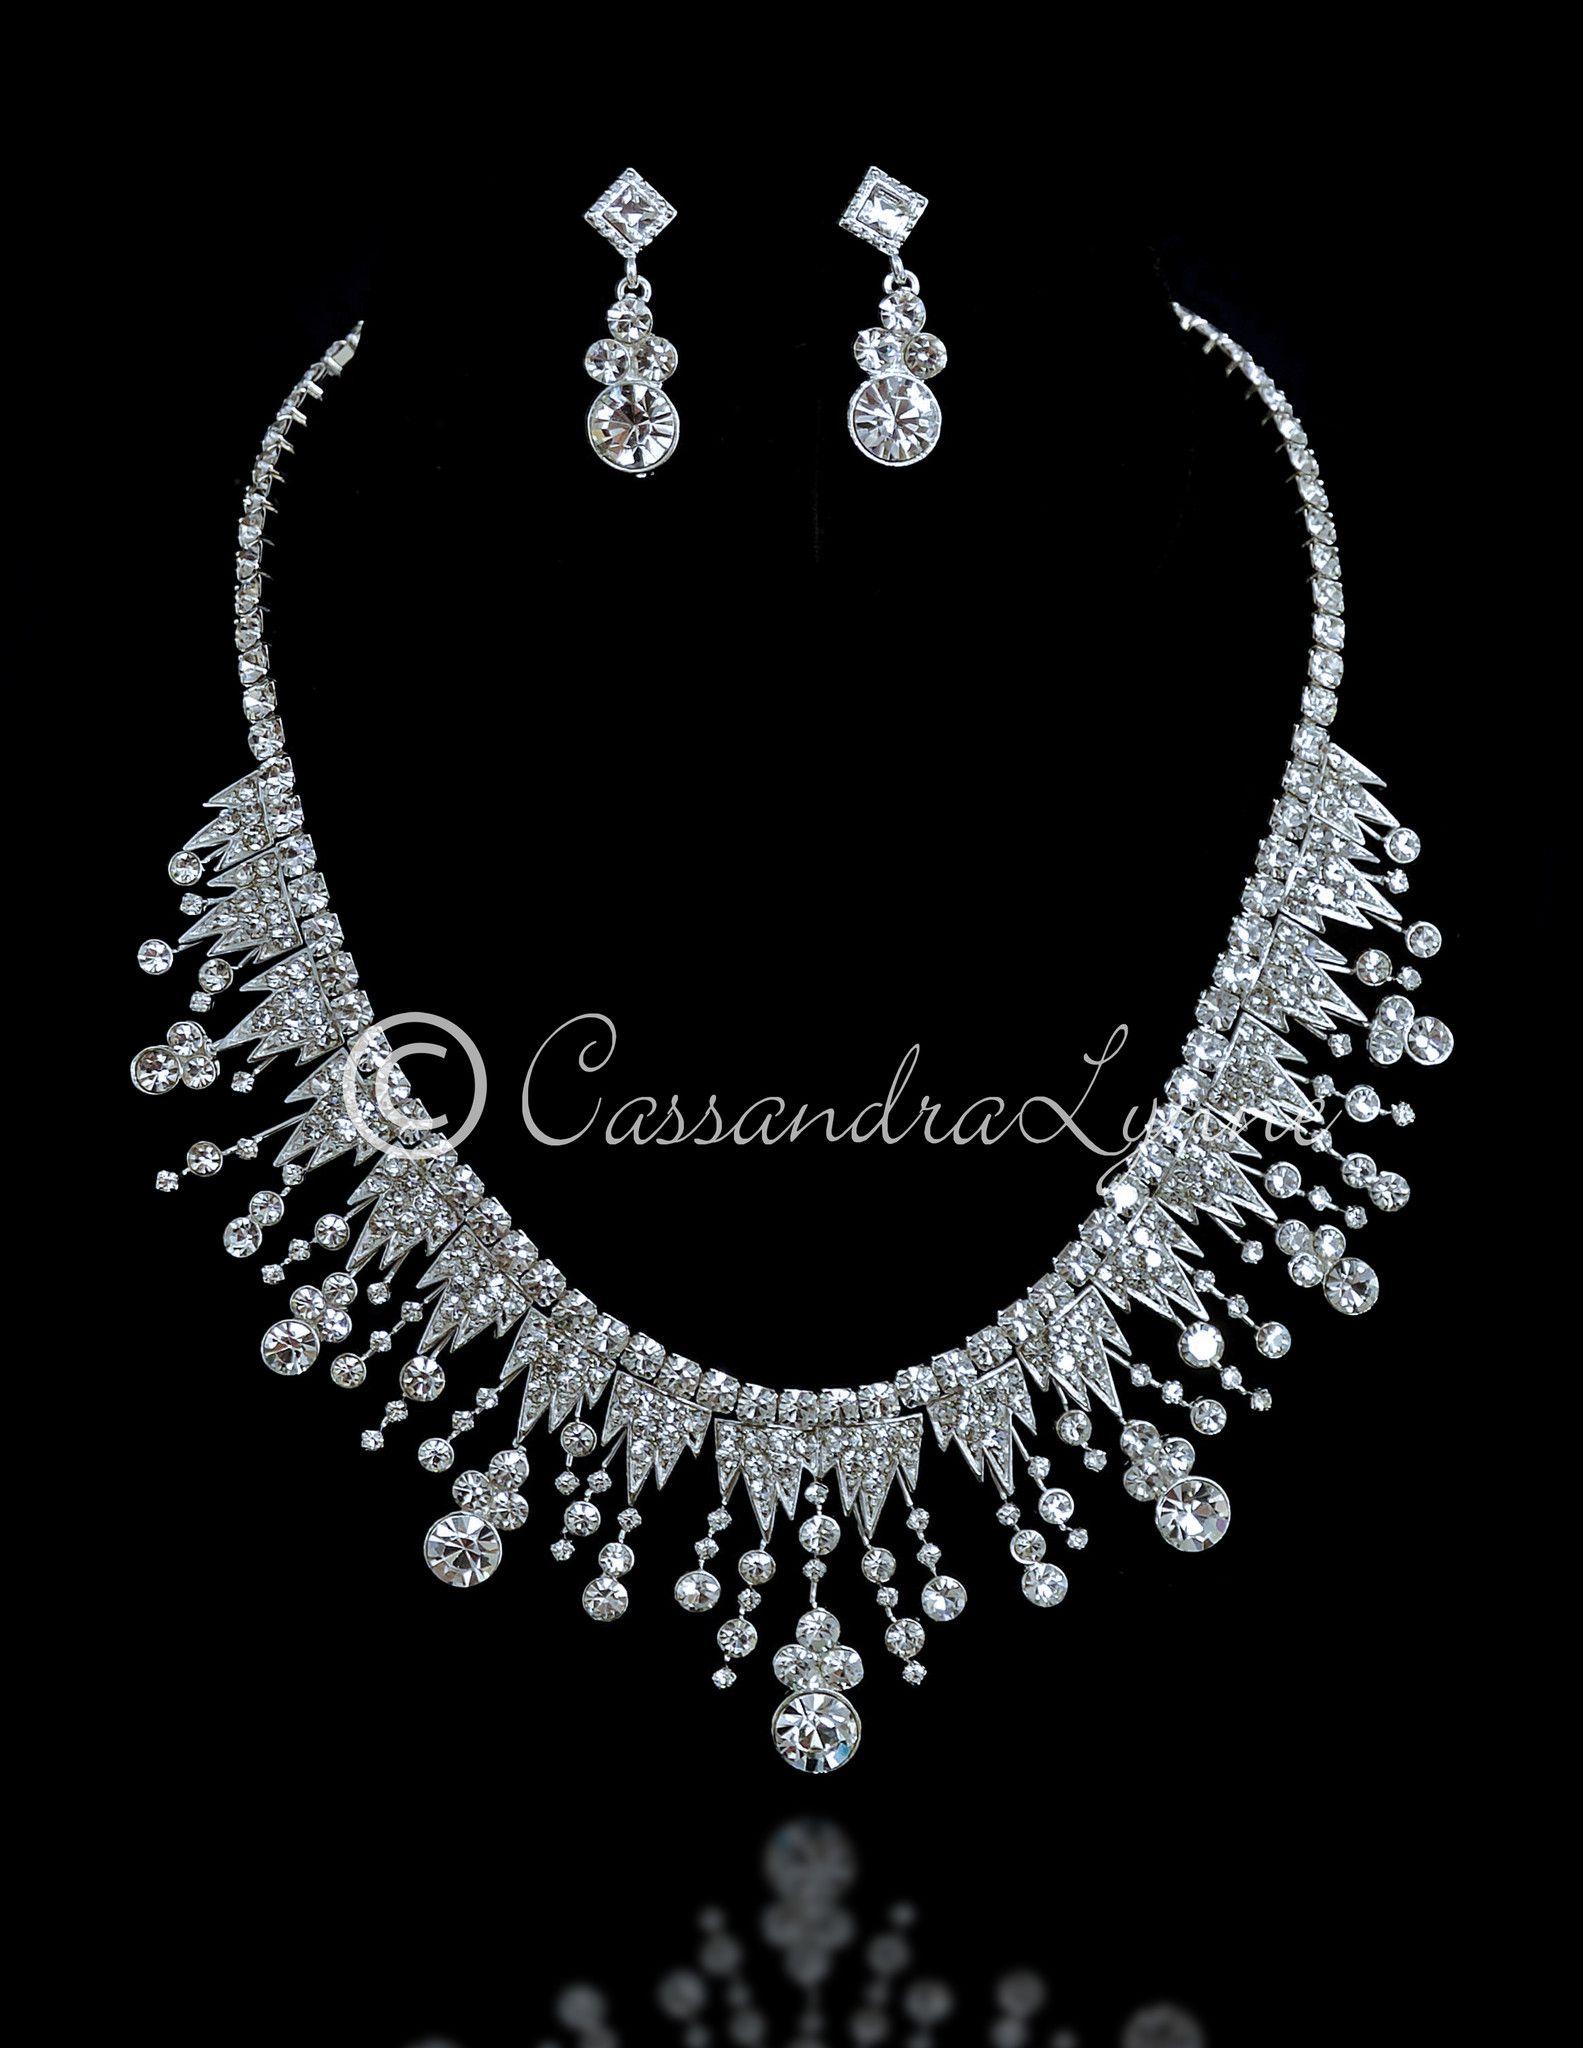 Modern Wedding Necklace Set of a Sunburst of Rhinestones from